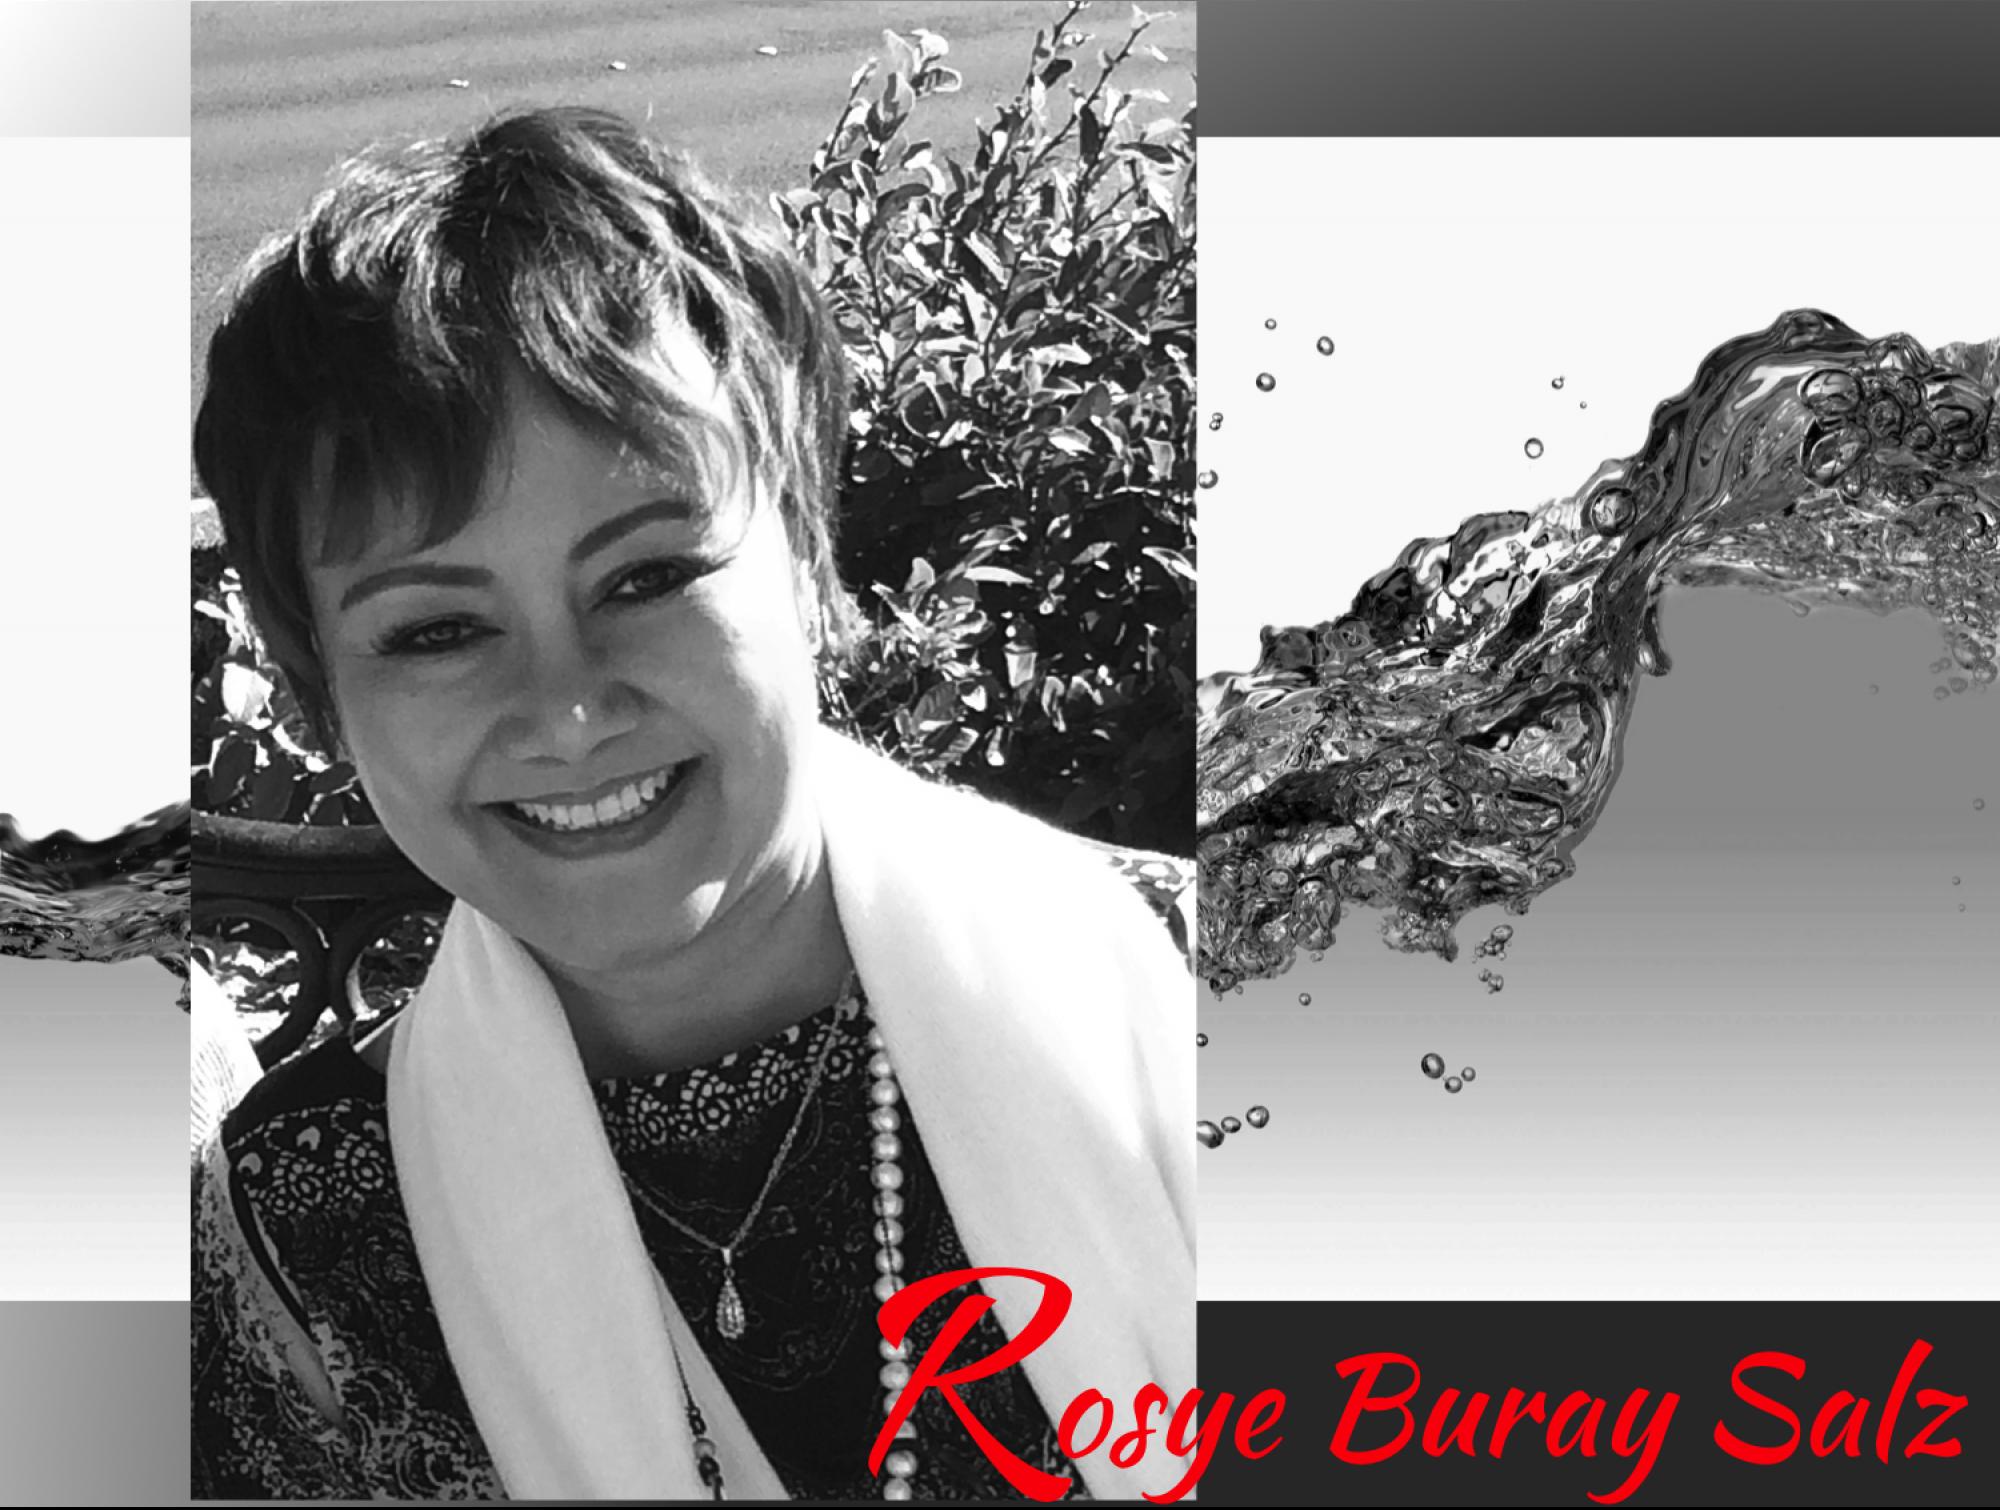 Rosye Buray Salz